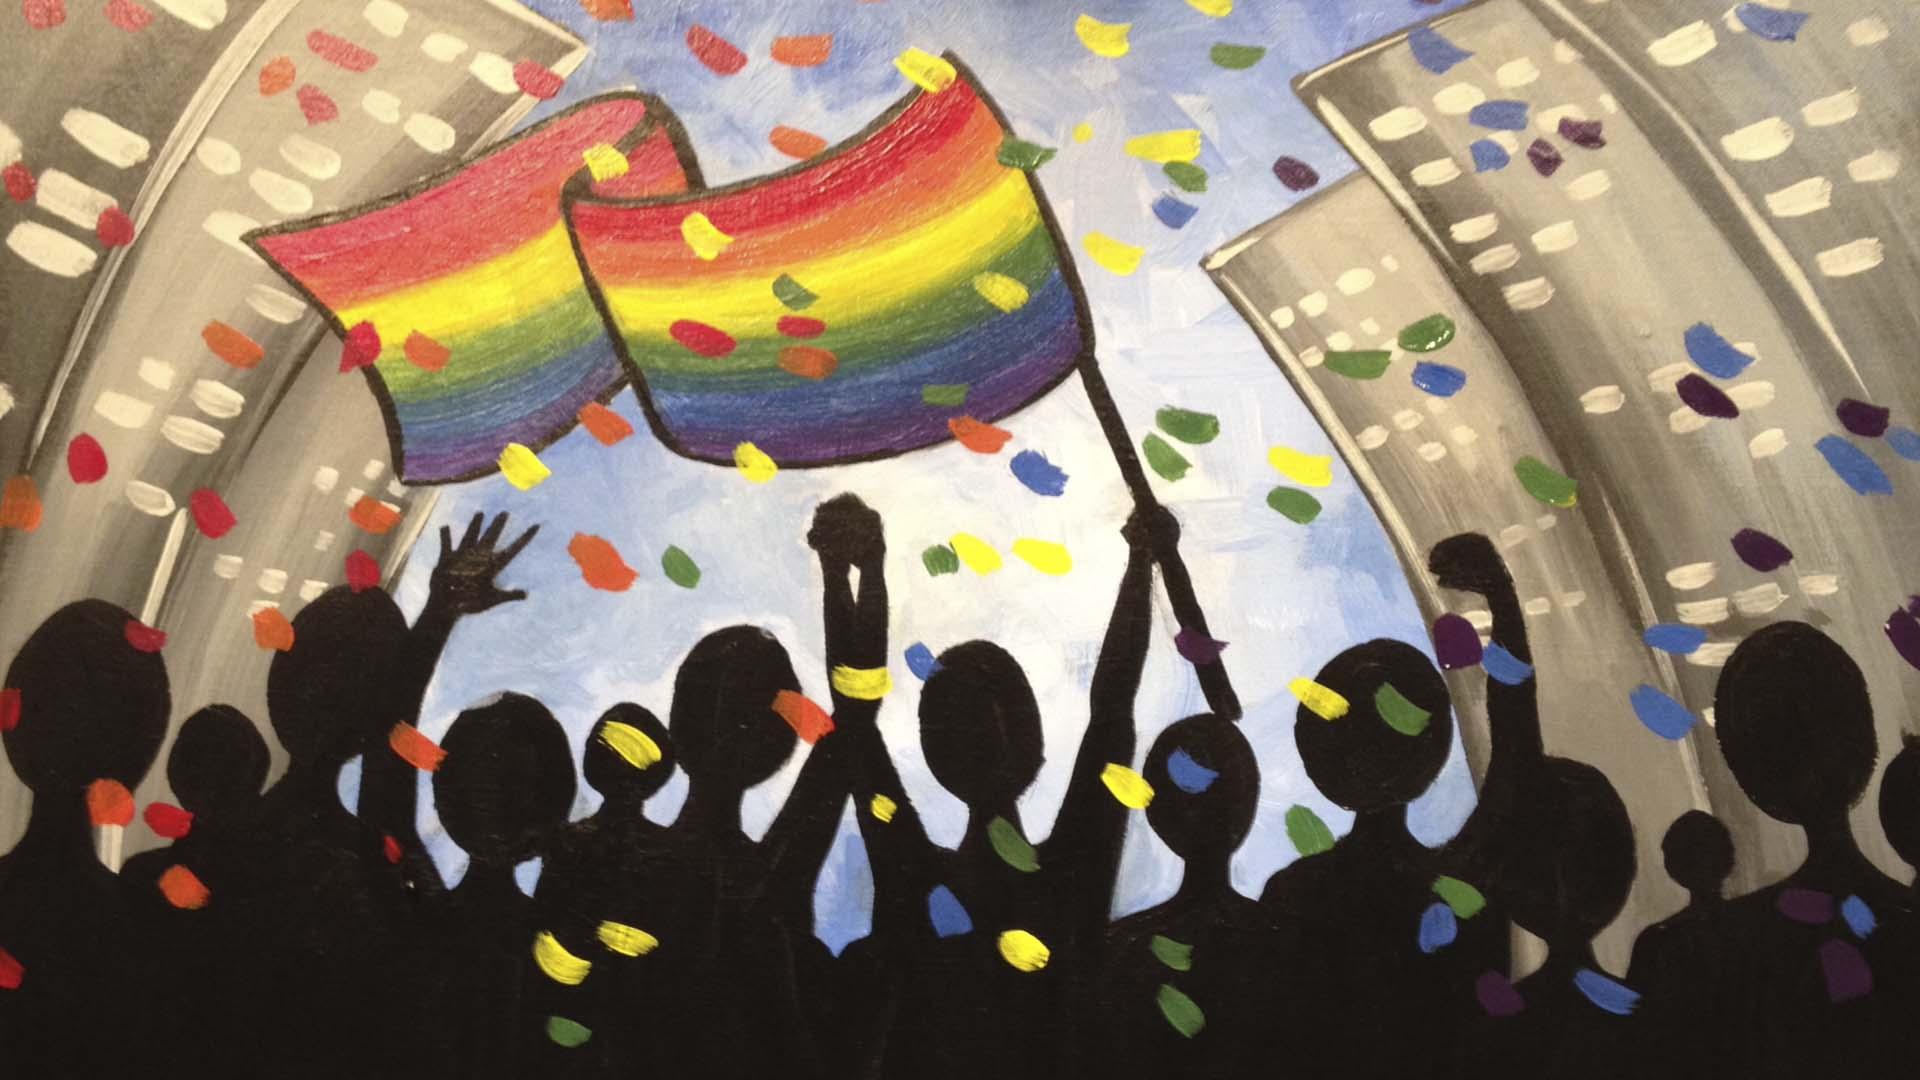 Orlando Pulse Paint It Forward #WeAreOrlando